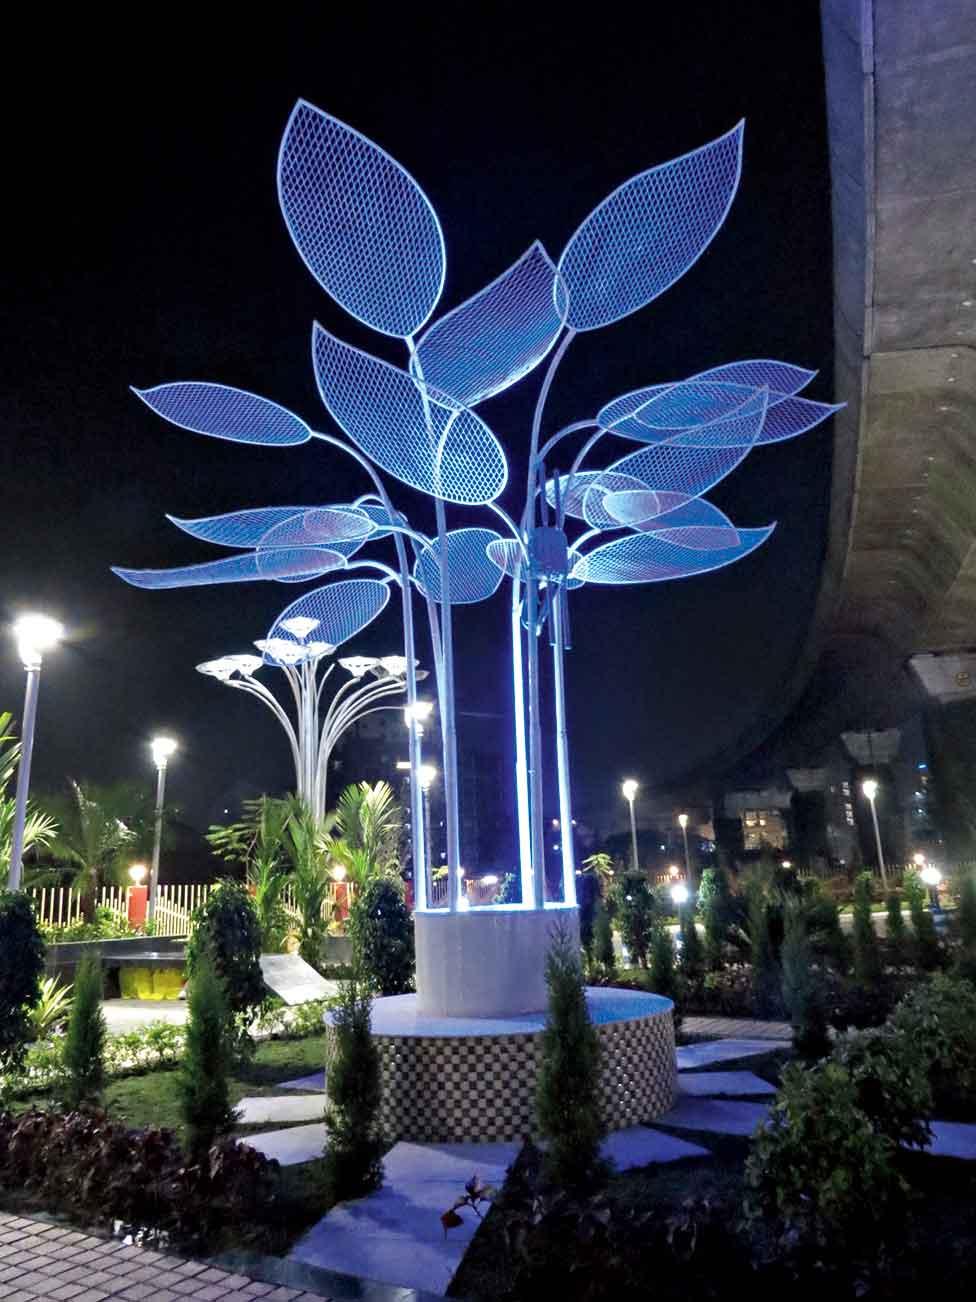 A wifi tree which creates a hotspot